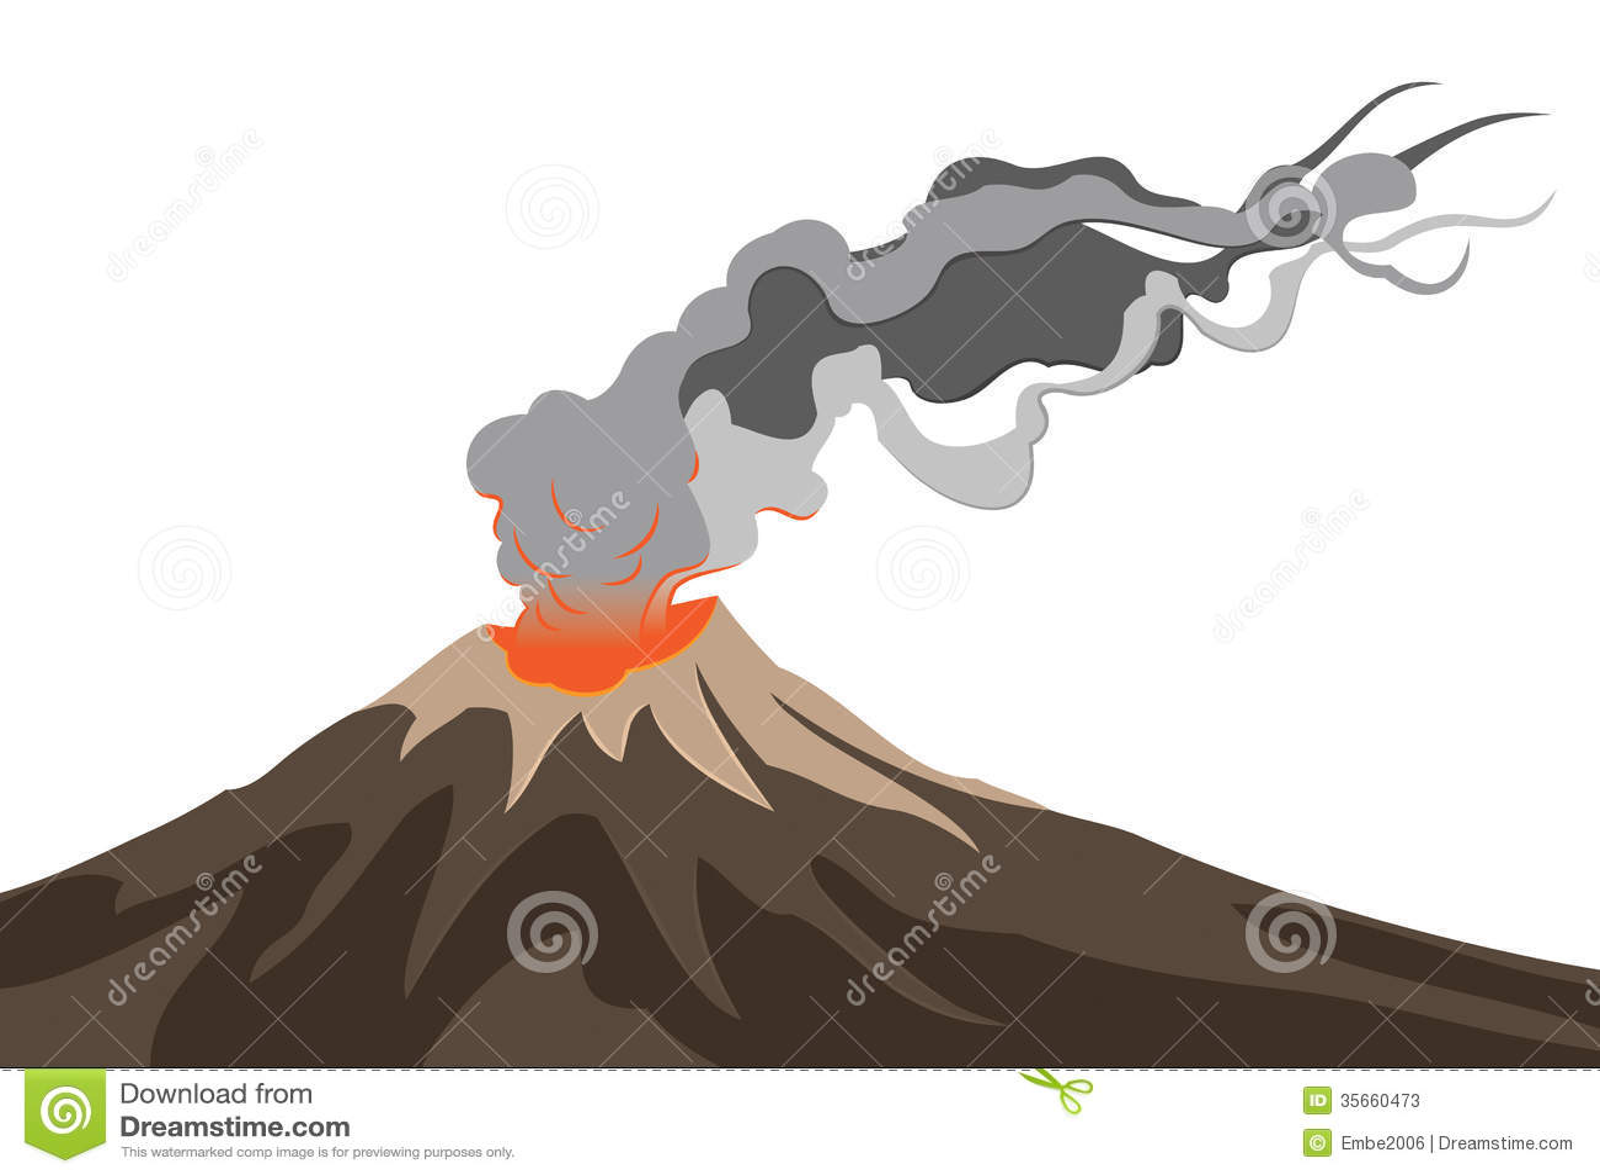 volcanologist clipart - photo #42